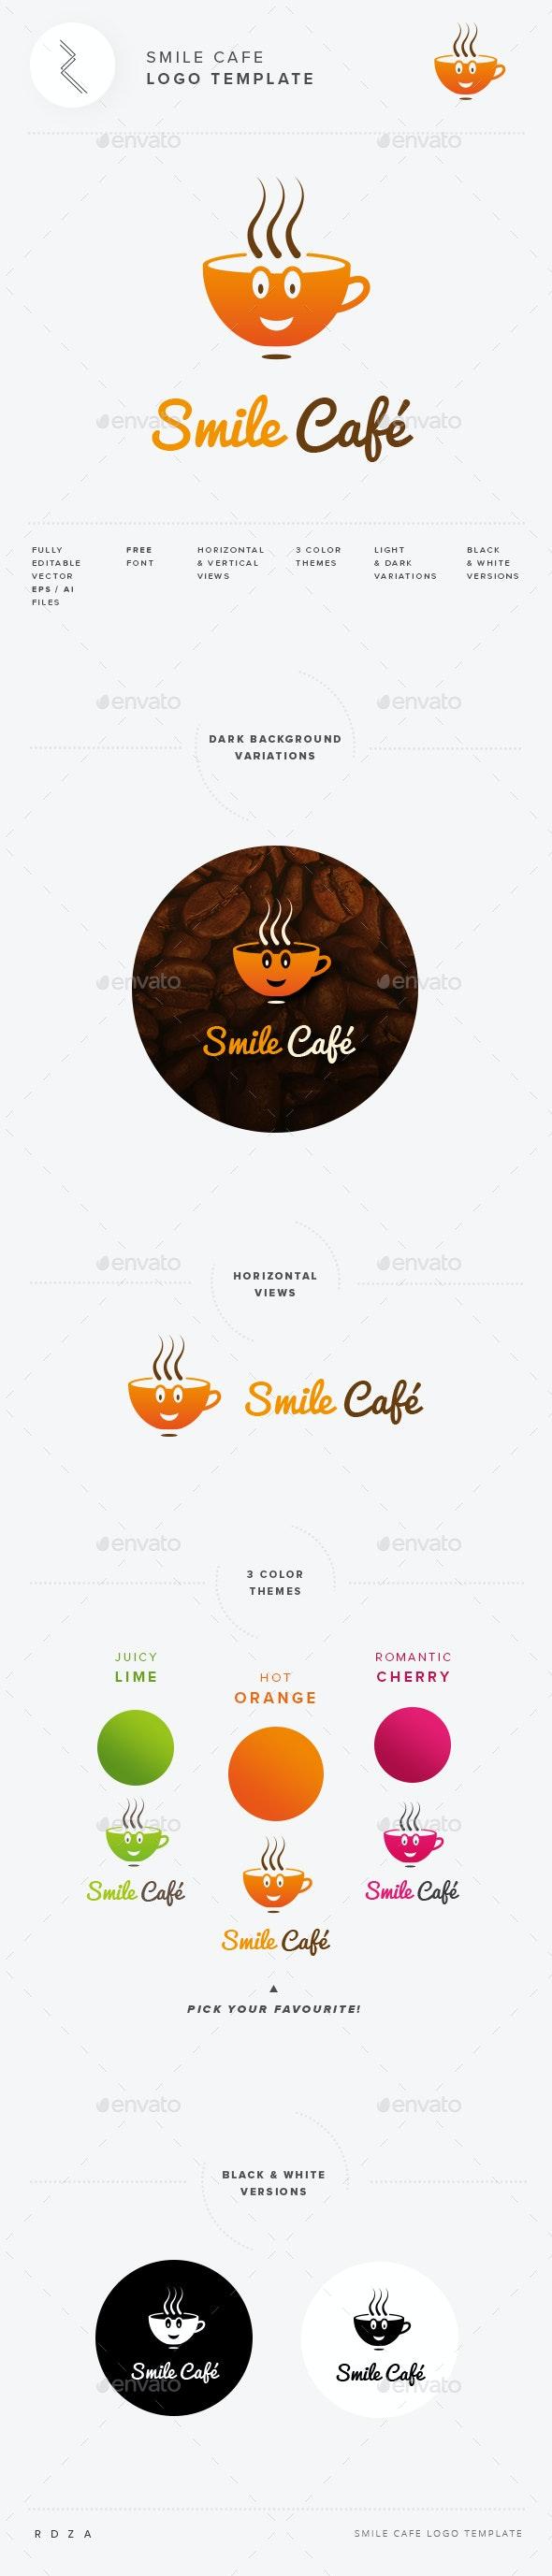 Smile Cafe Logo Template - Restaurant Logo Templates